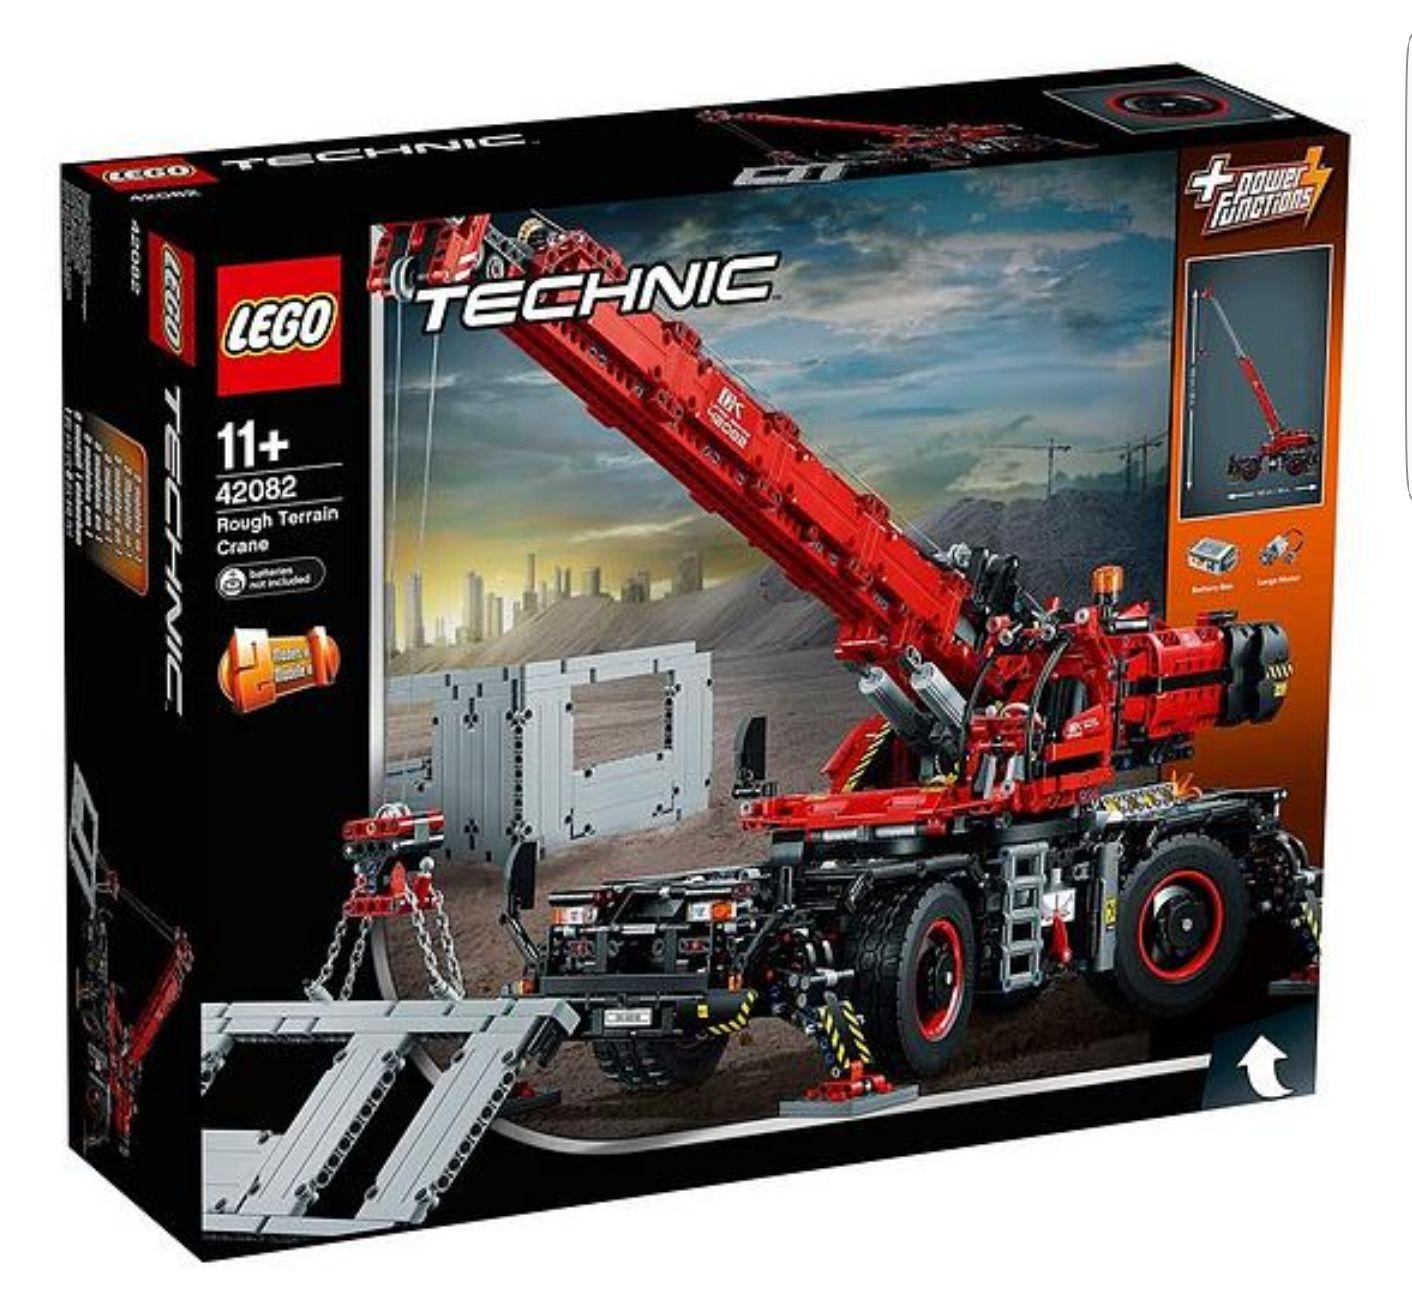 Lego Technic 42082 Rough Terrain Crane £169.99 @ Very